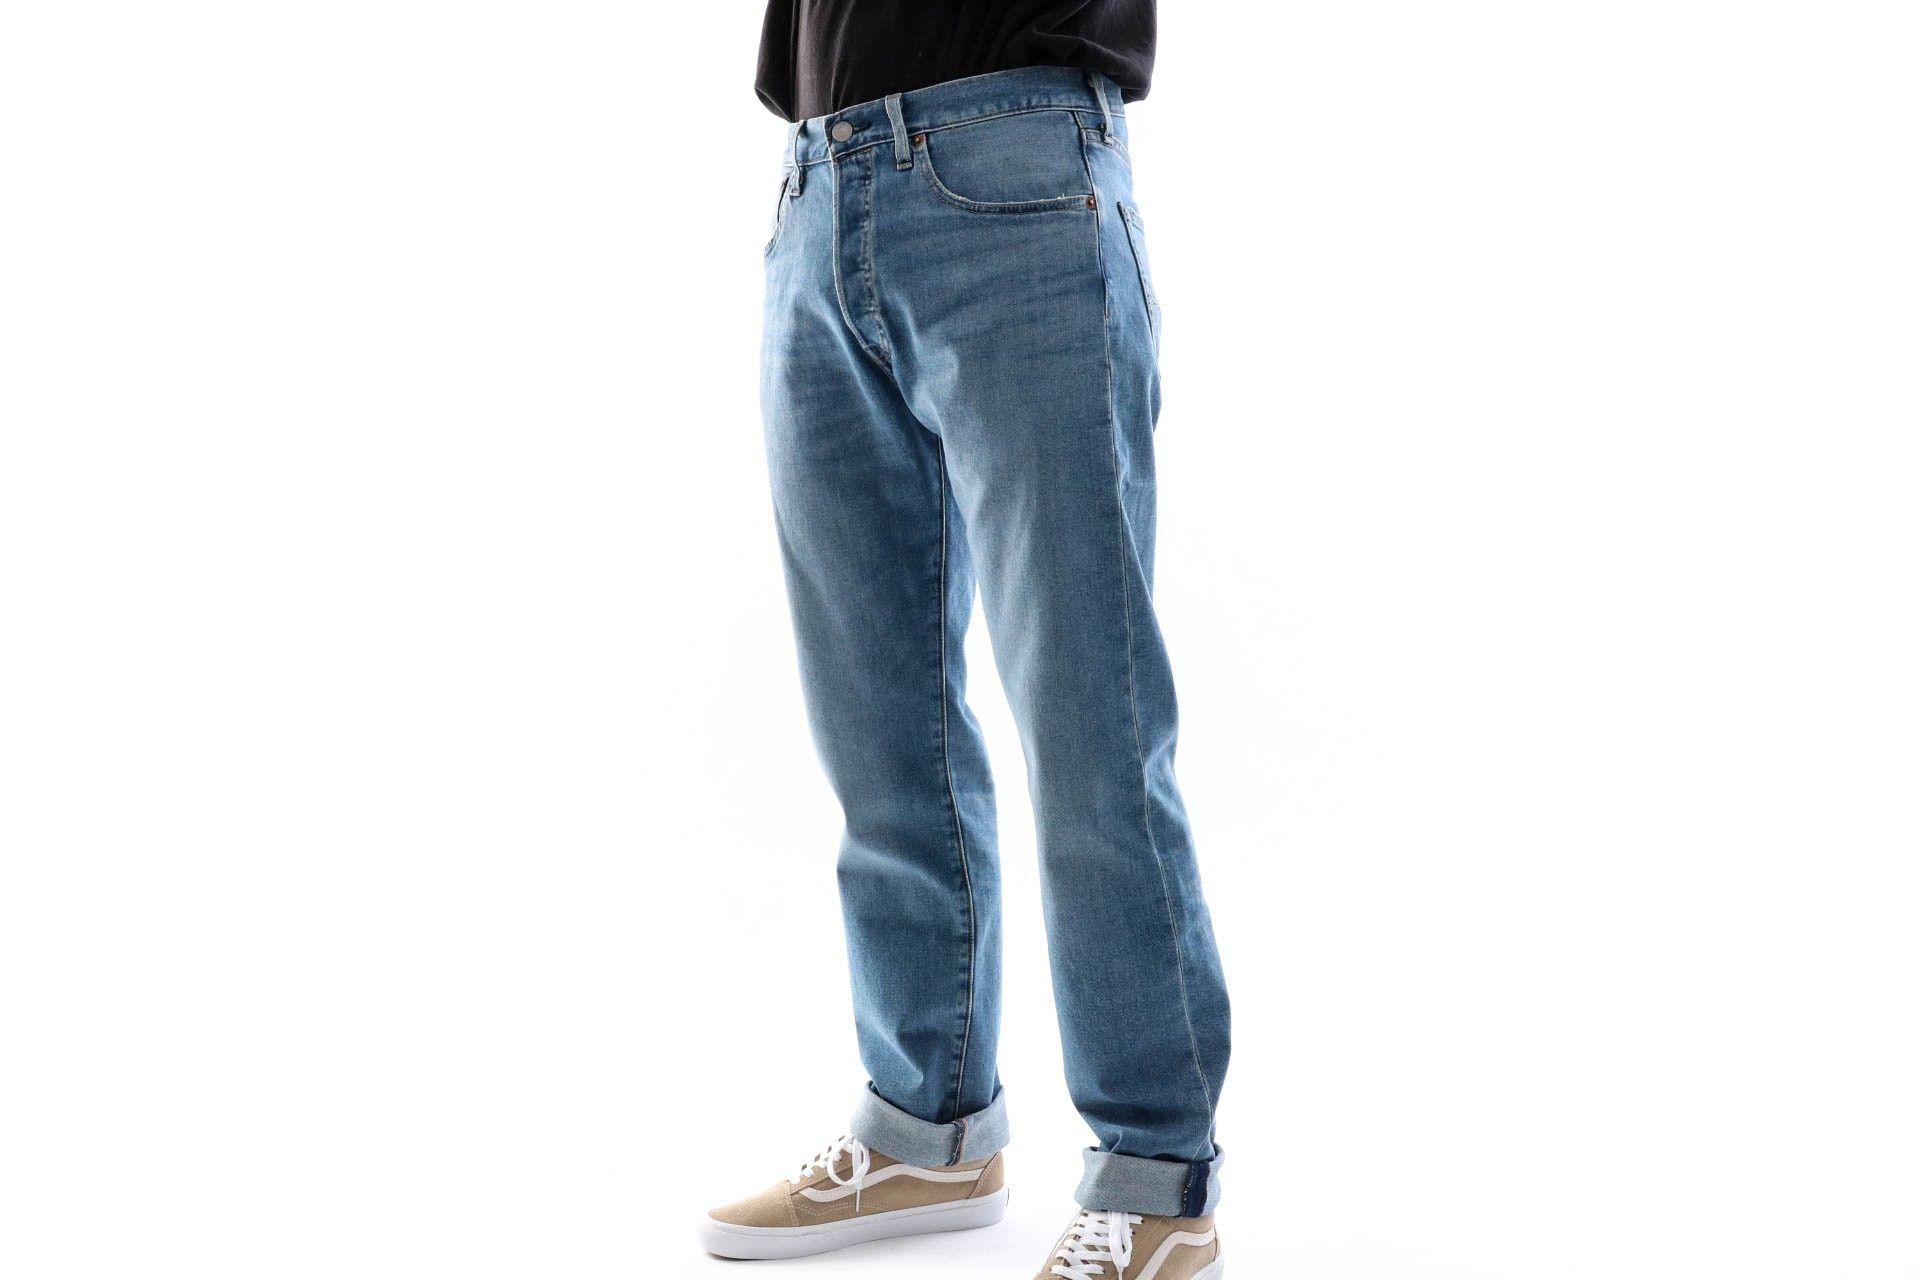 Afbeelding van Levi's Jeans 501® Levi'S® Original Fit Ironwood Overt 00501-2920